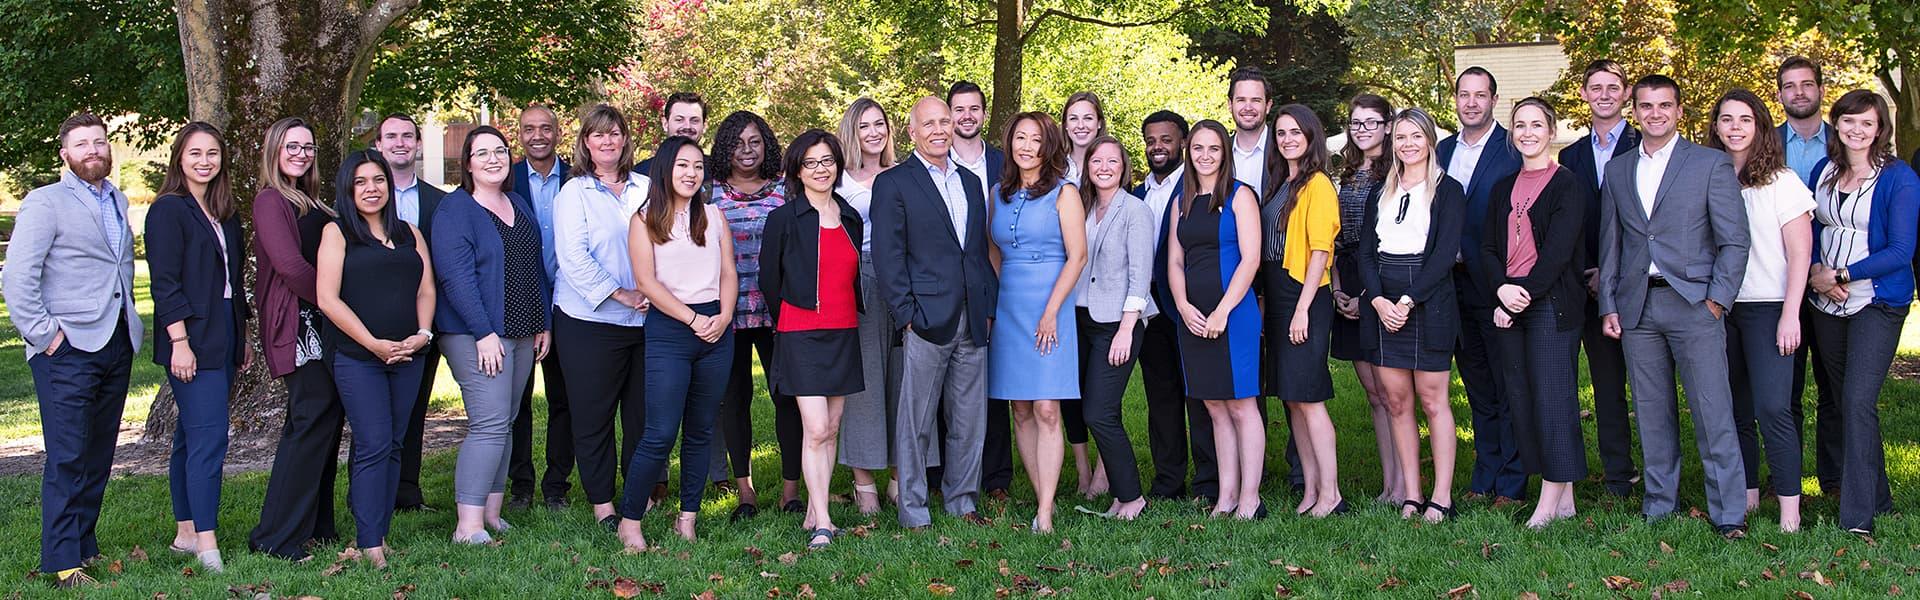 JVM Lending Team Group Photo